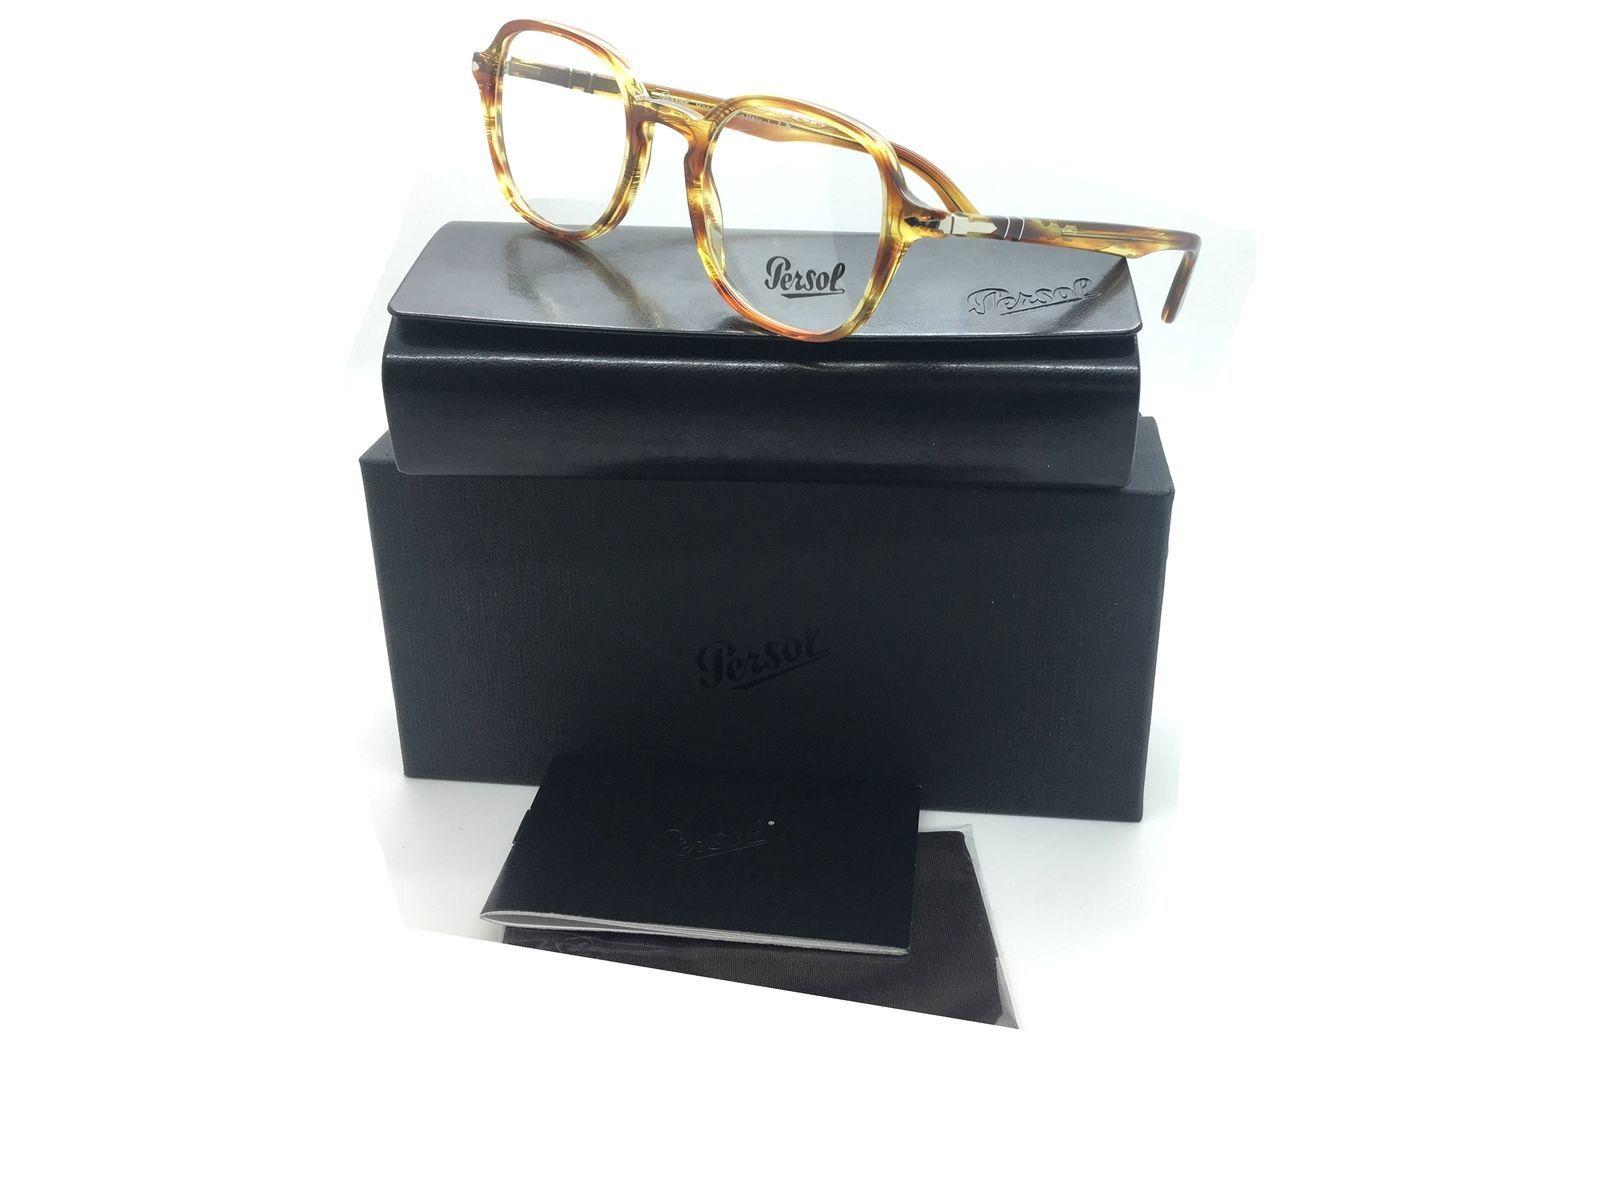 070aca4309f1e Persol Brown Eyeglasses PO 3142 V 1050 47 mm and 50 similar items. S l1600